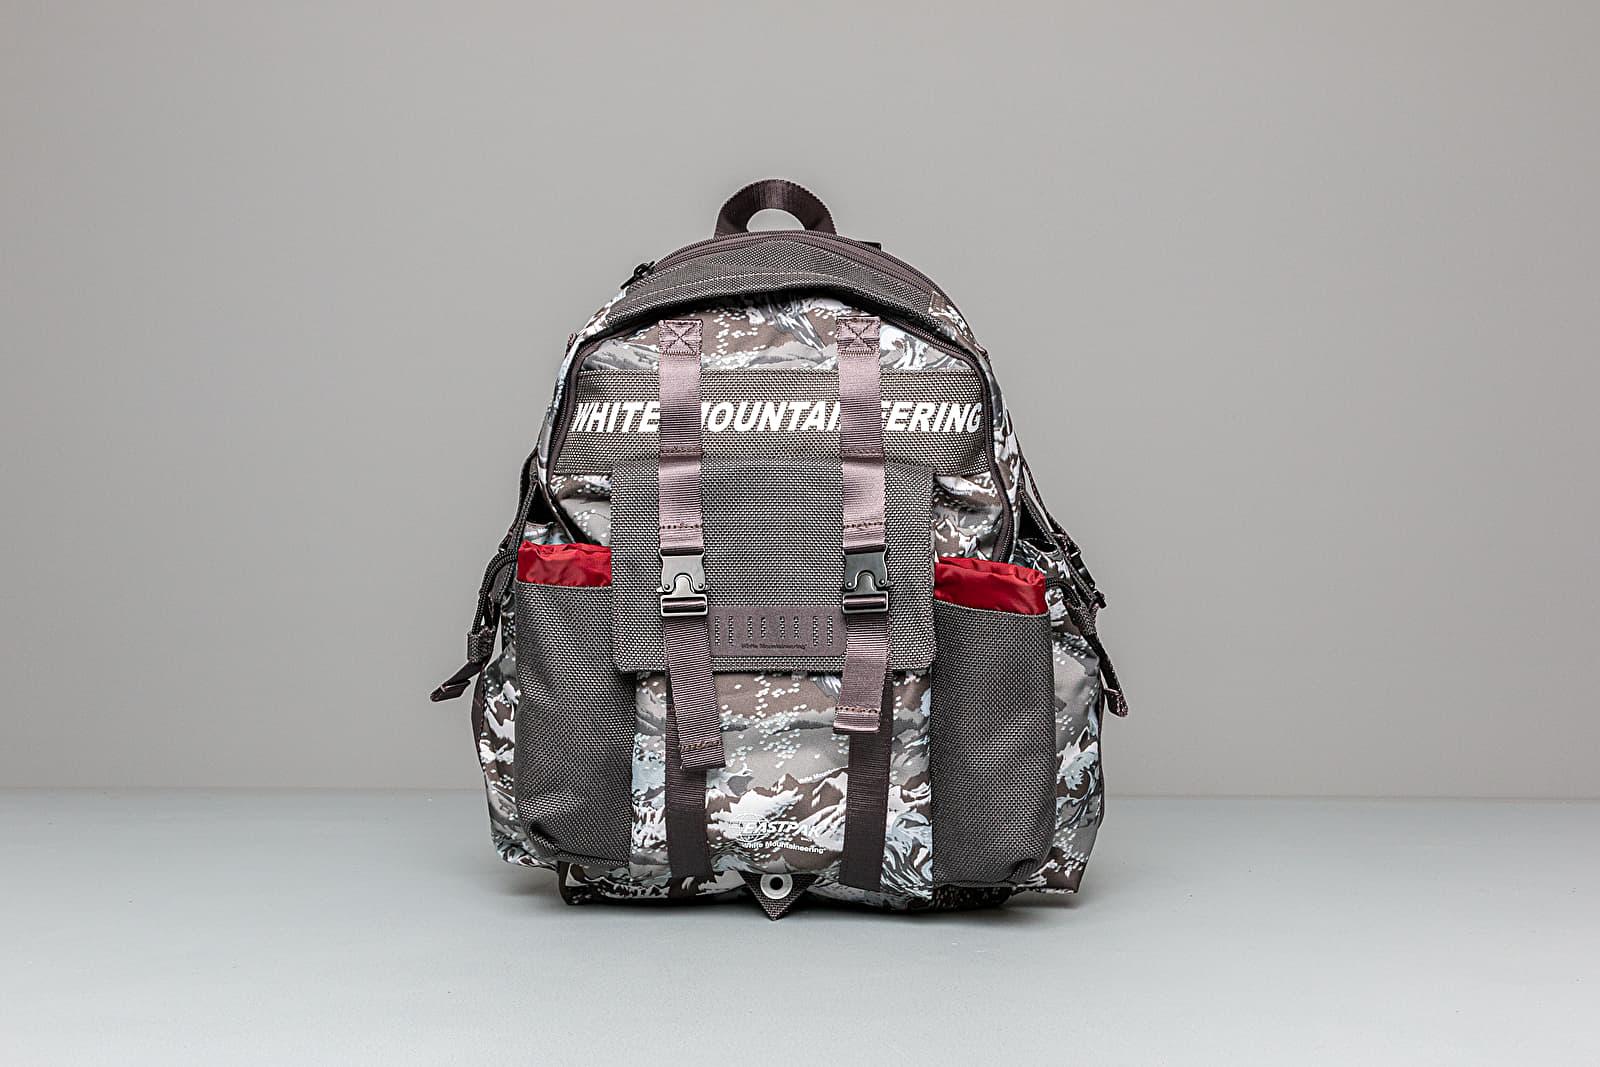 Eastpak x White Mountaineering Pak'r Backpack